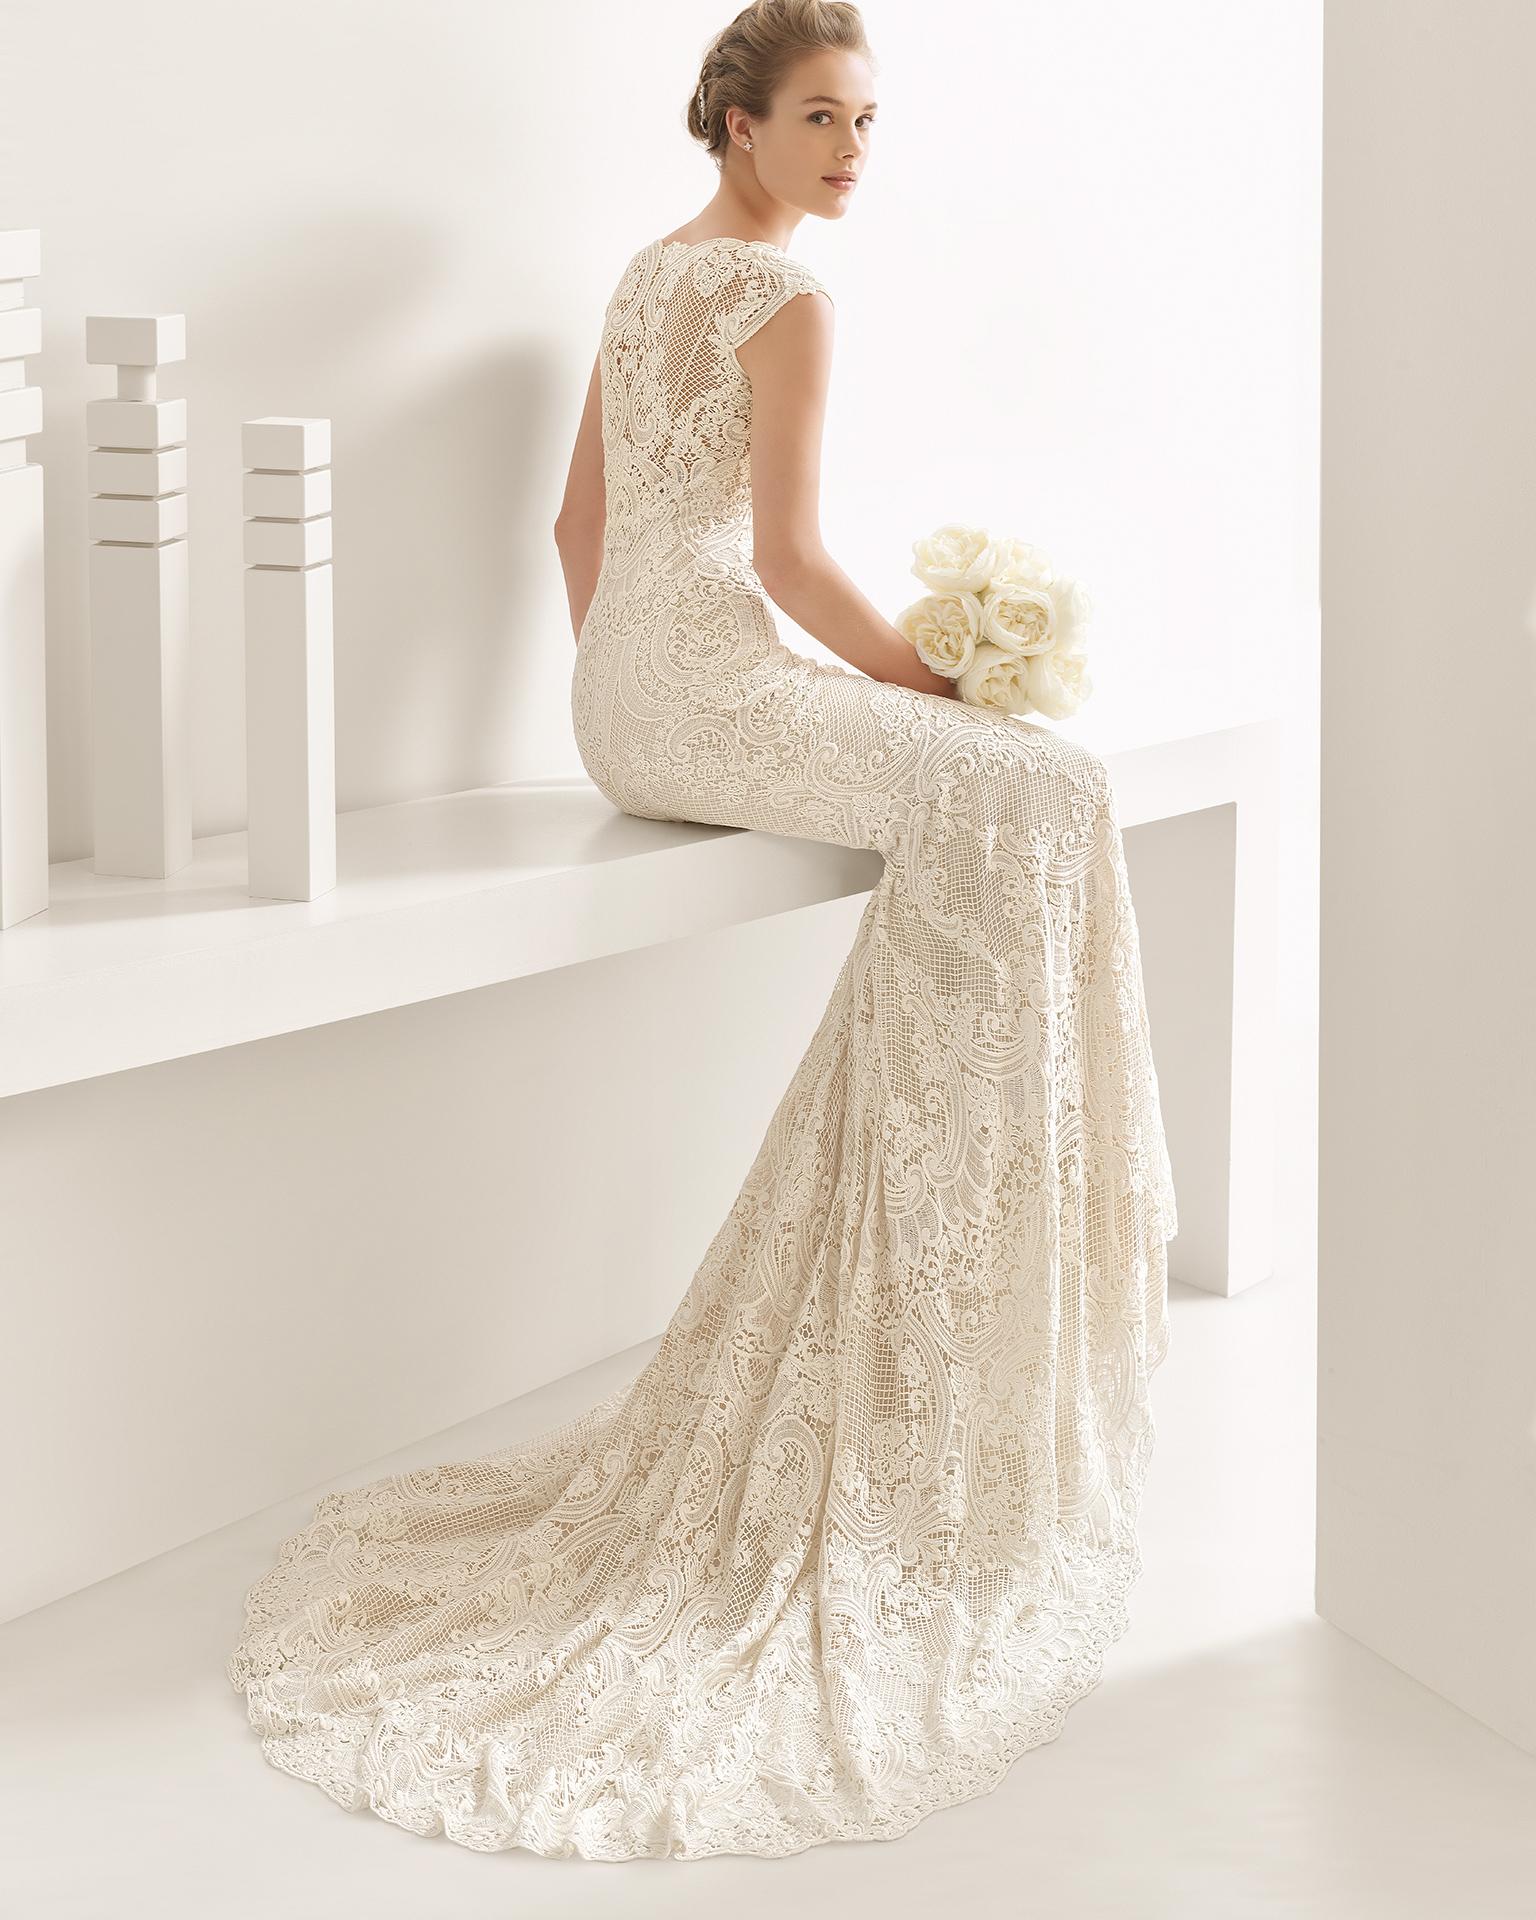 Next: Haute Couture Wedding Dress Sitting At Reisefeber.org